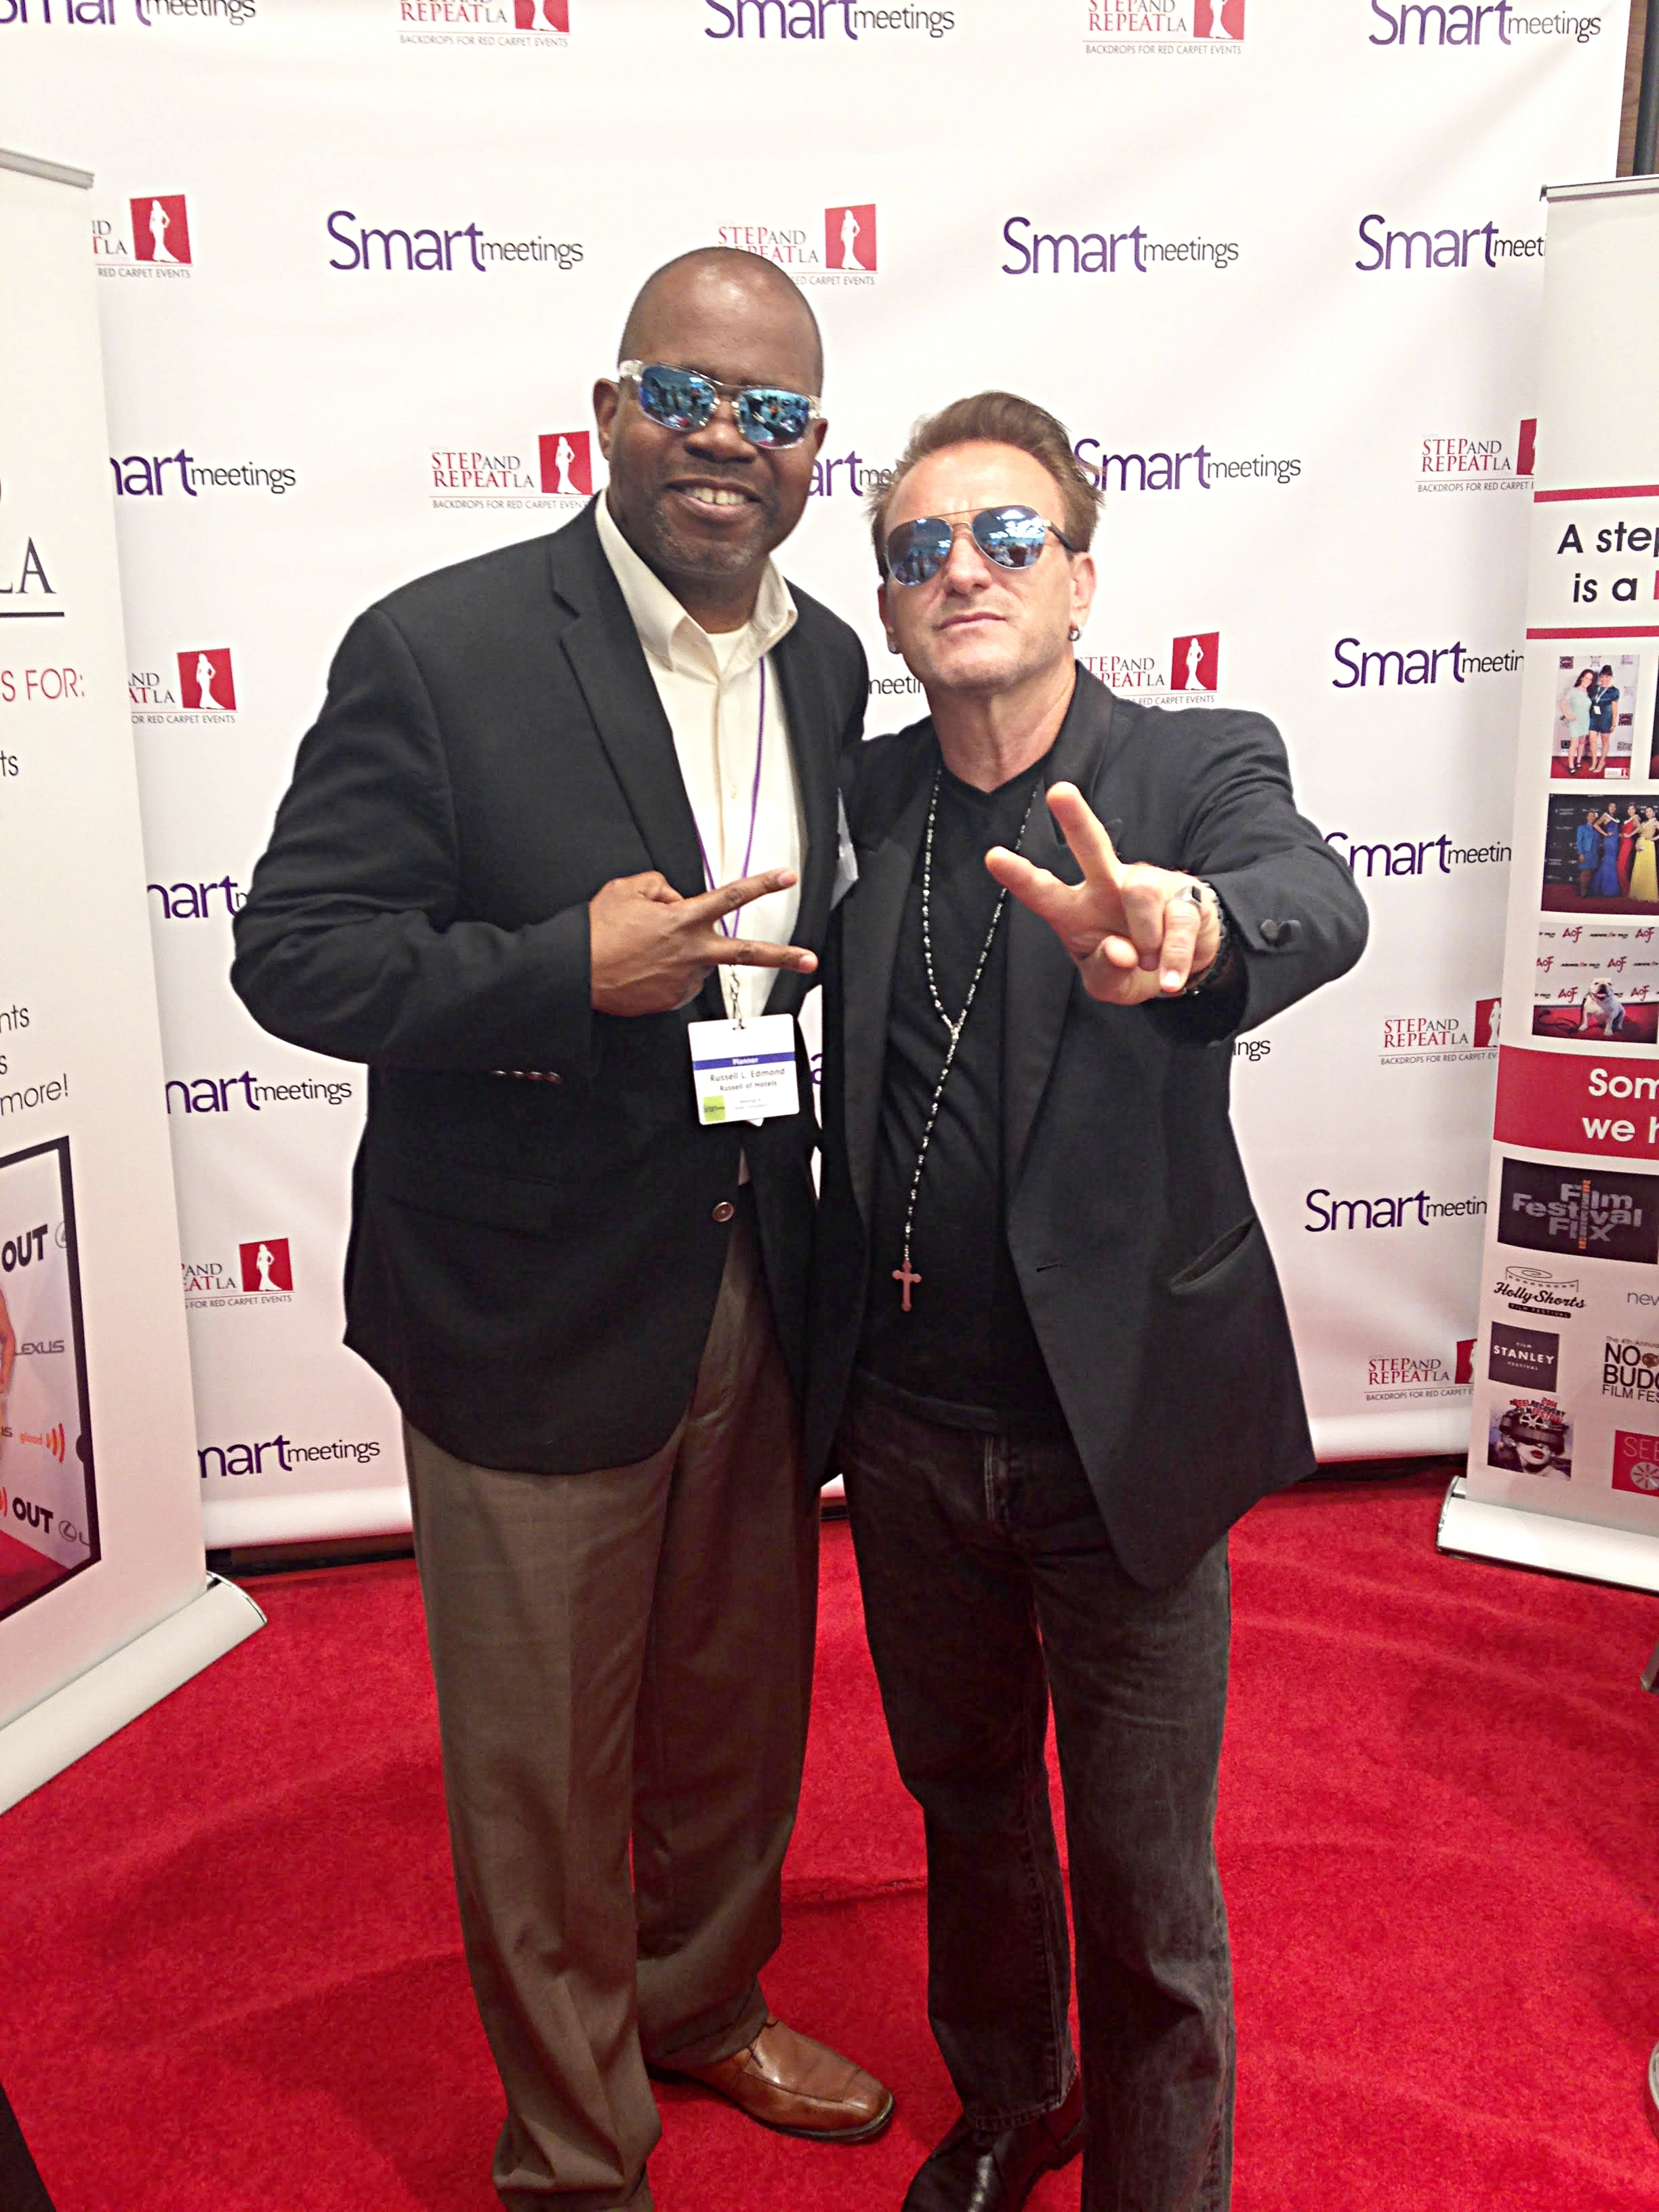 With Bono!